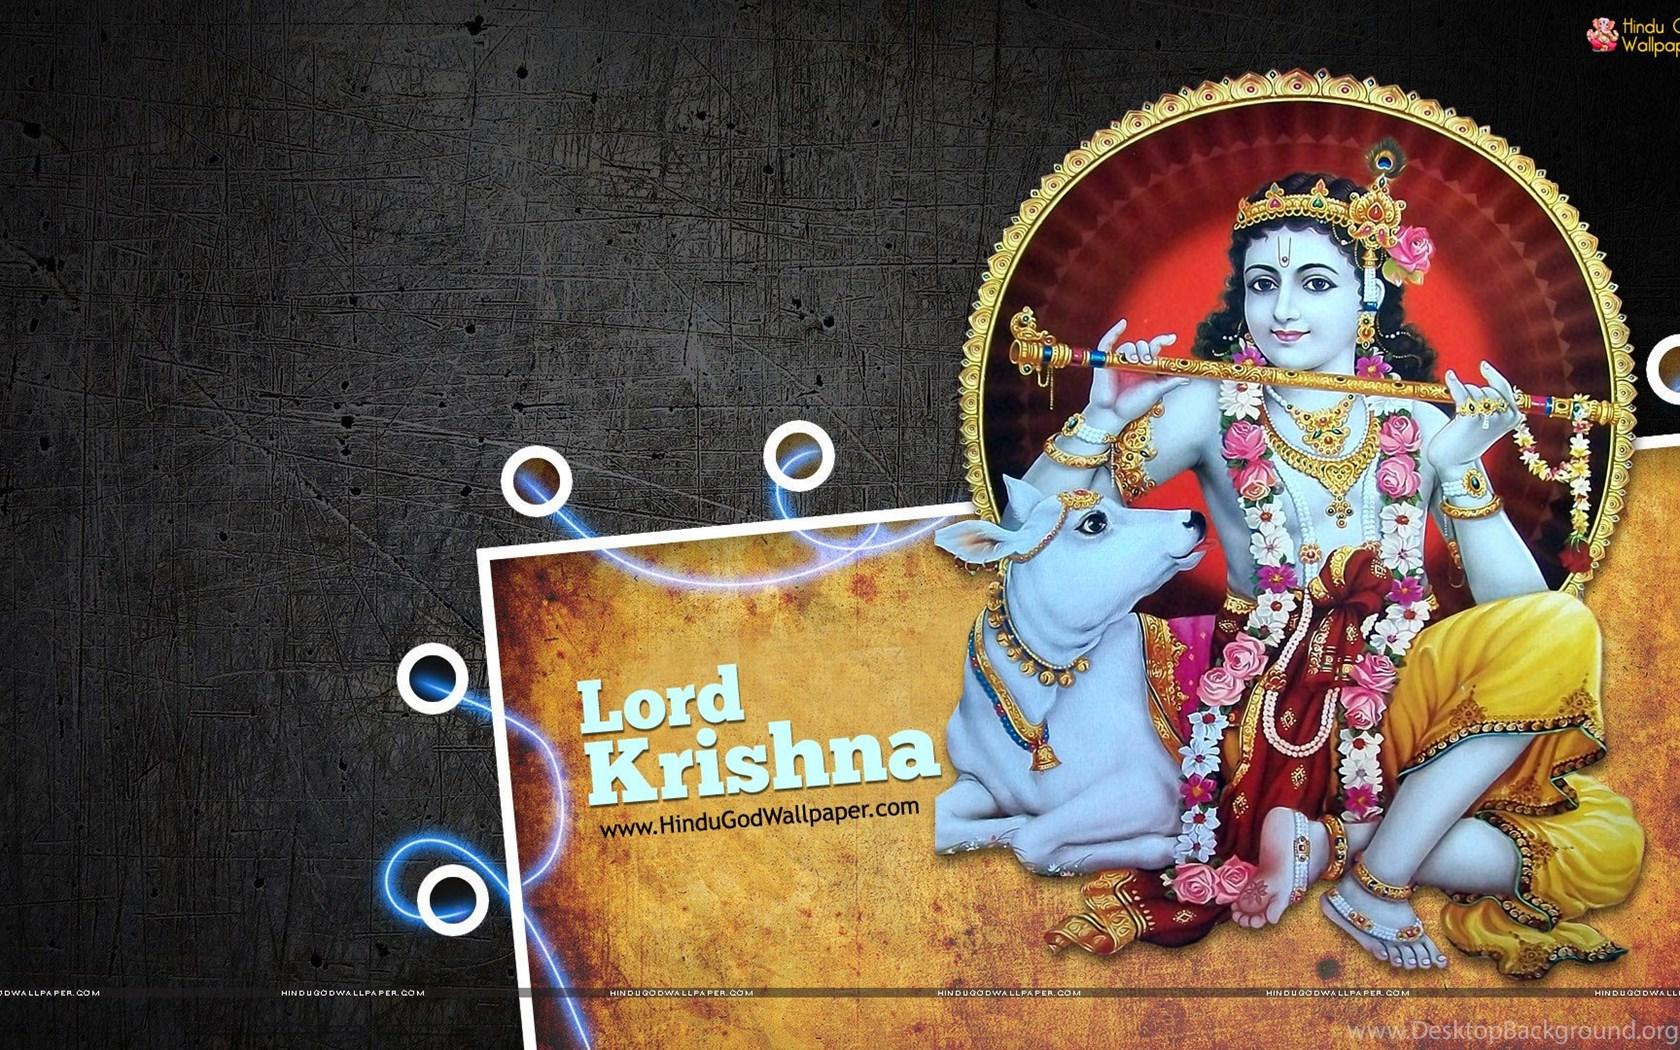 Lord Krishna Wallpapers 1080p Hd Full Size Download Desktop Background